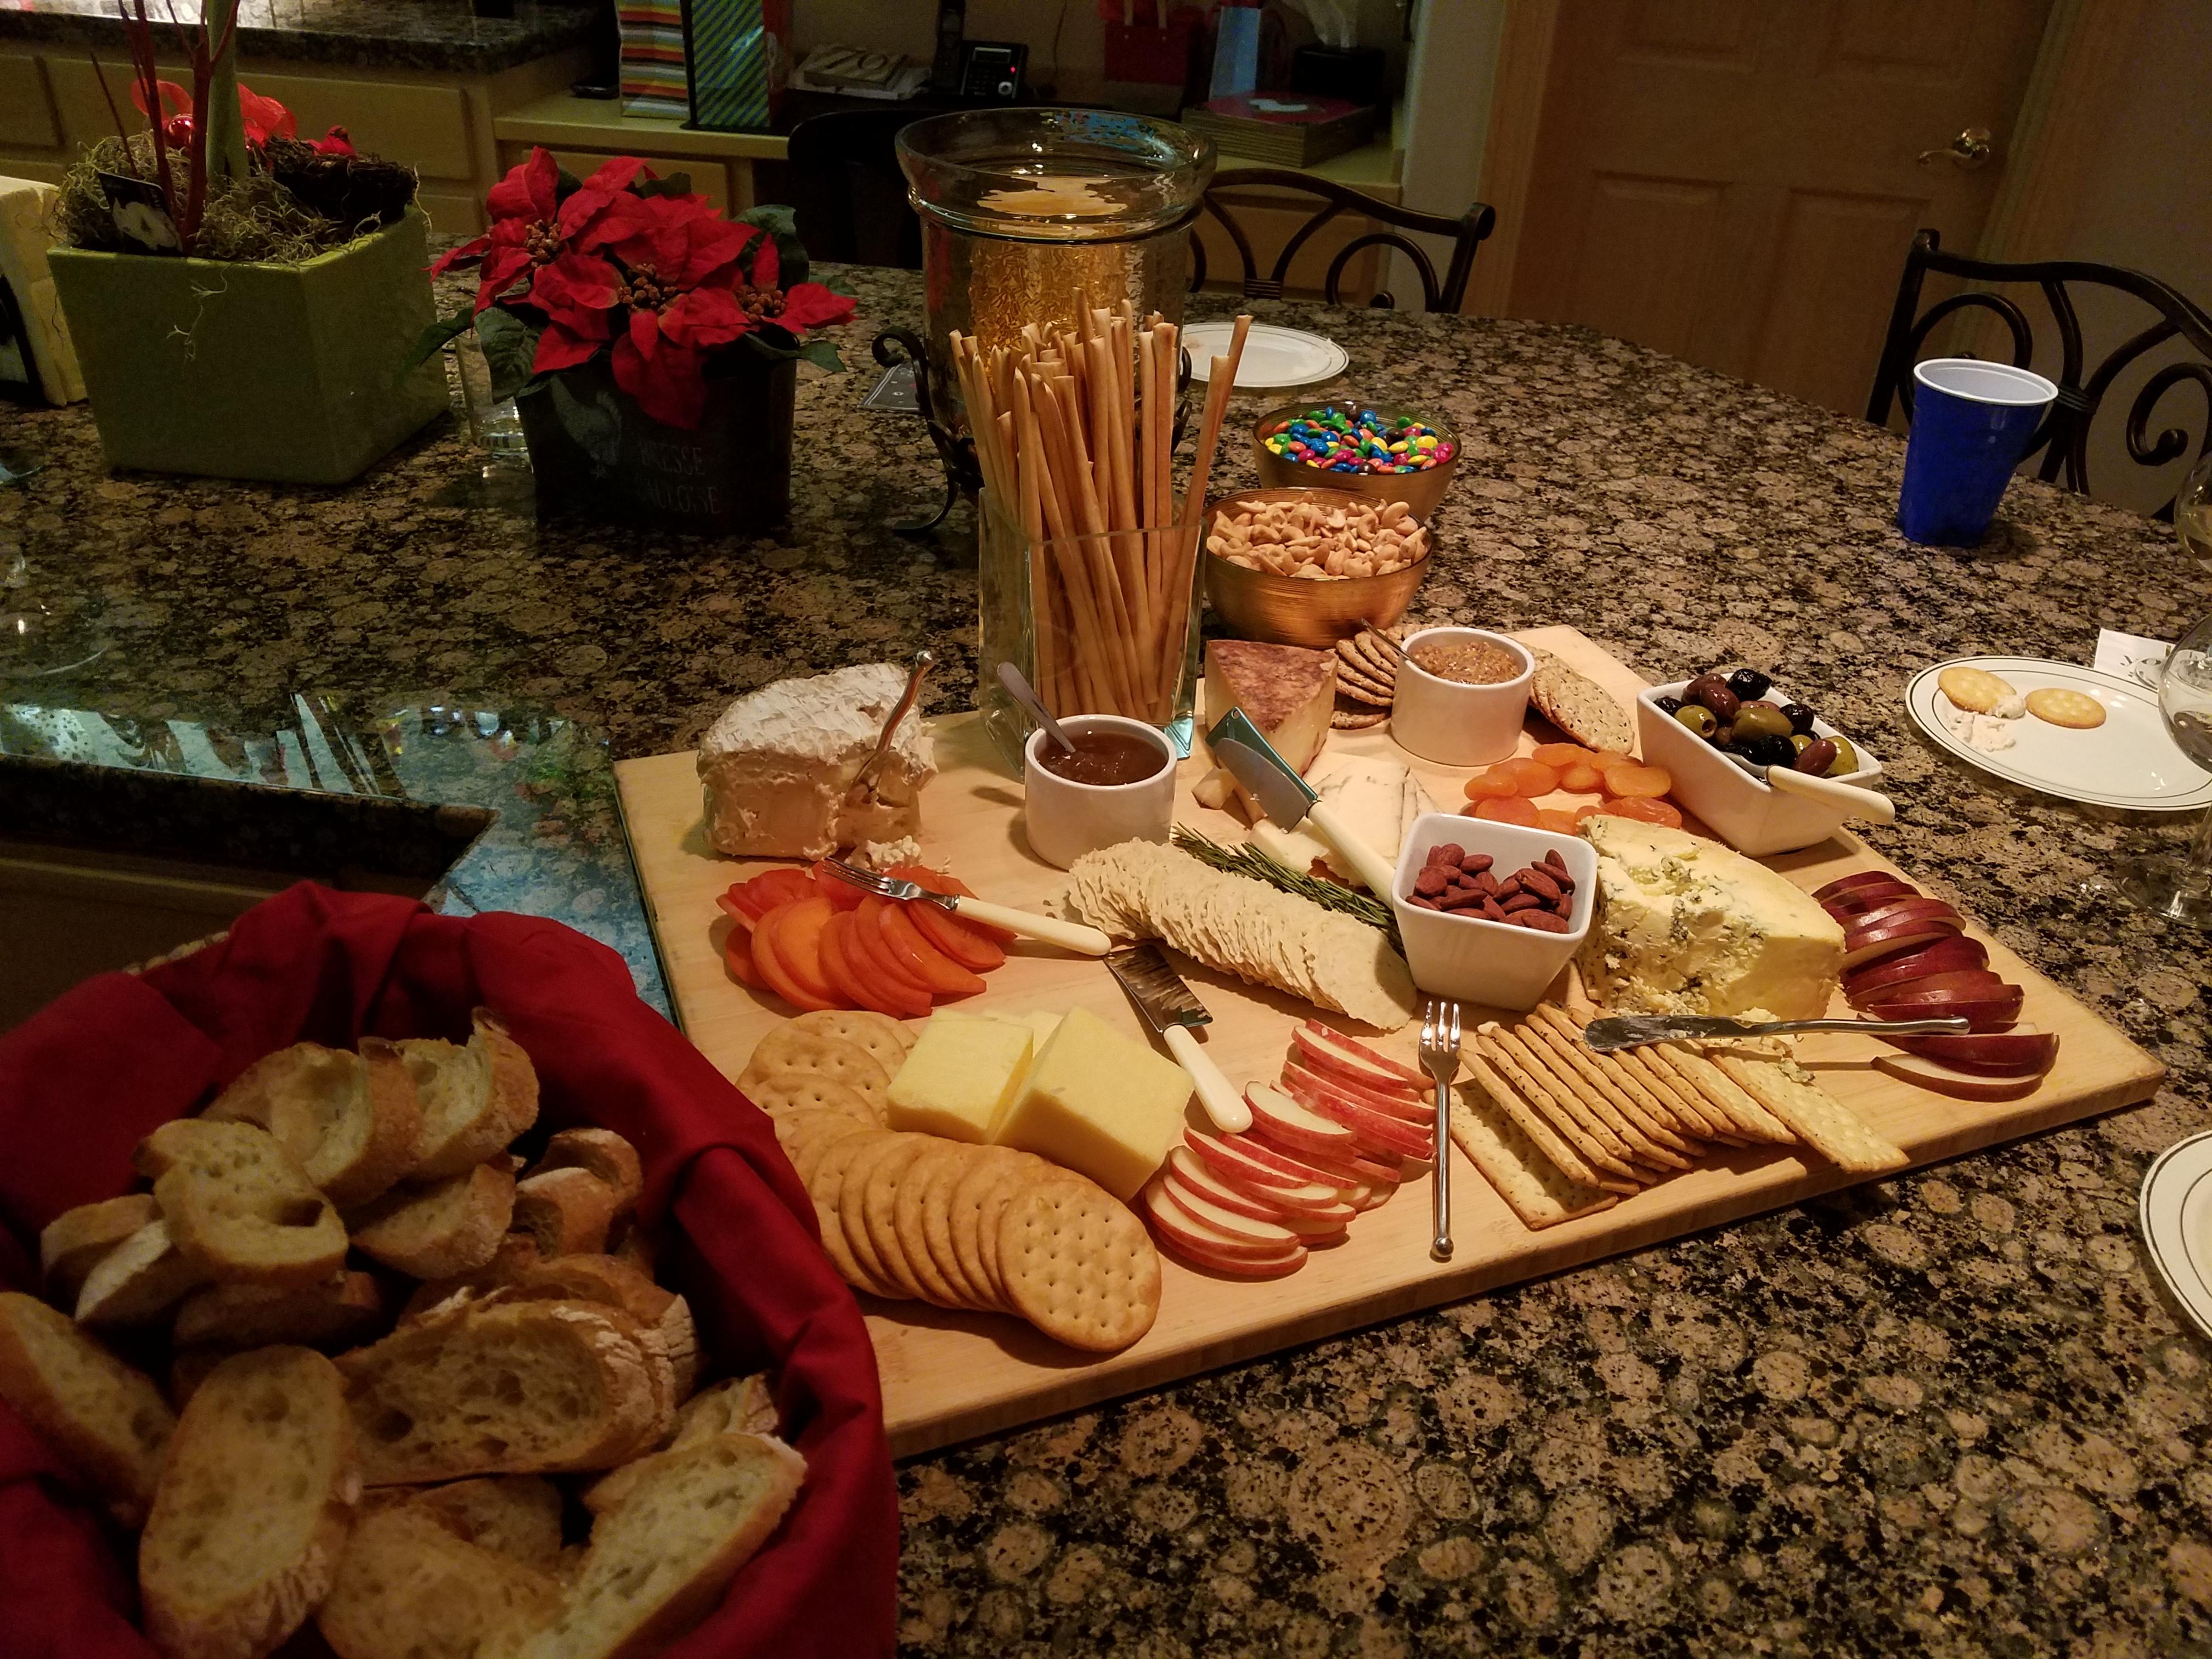 Char - Cheese Apples Croustini